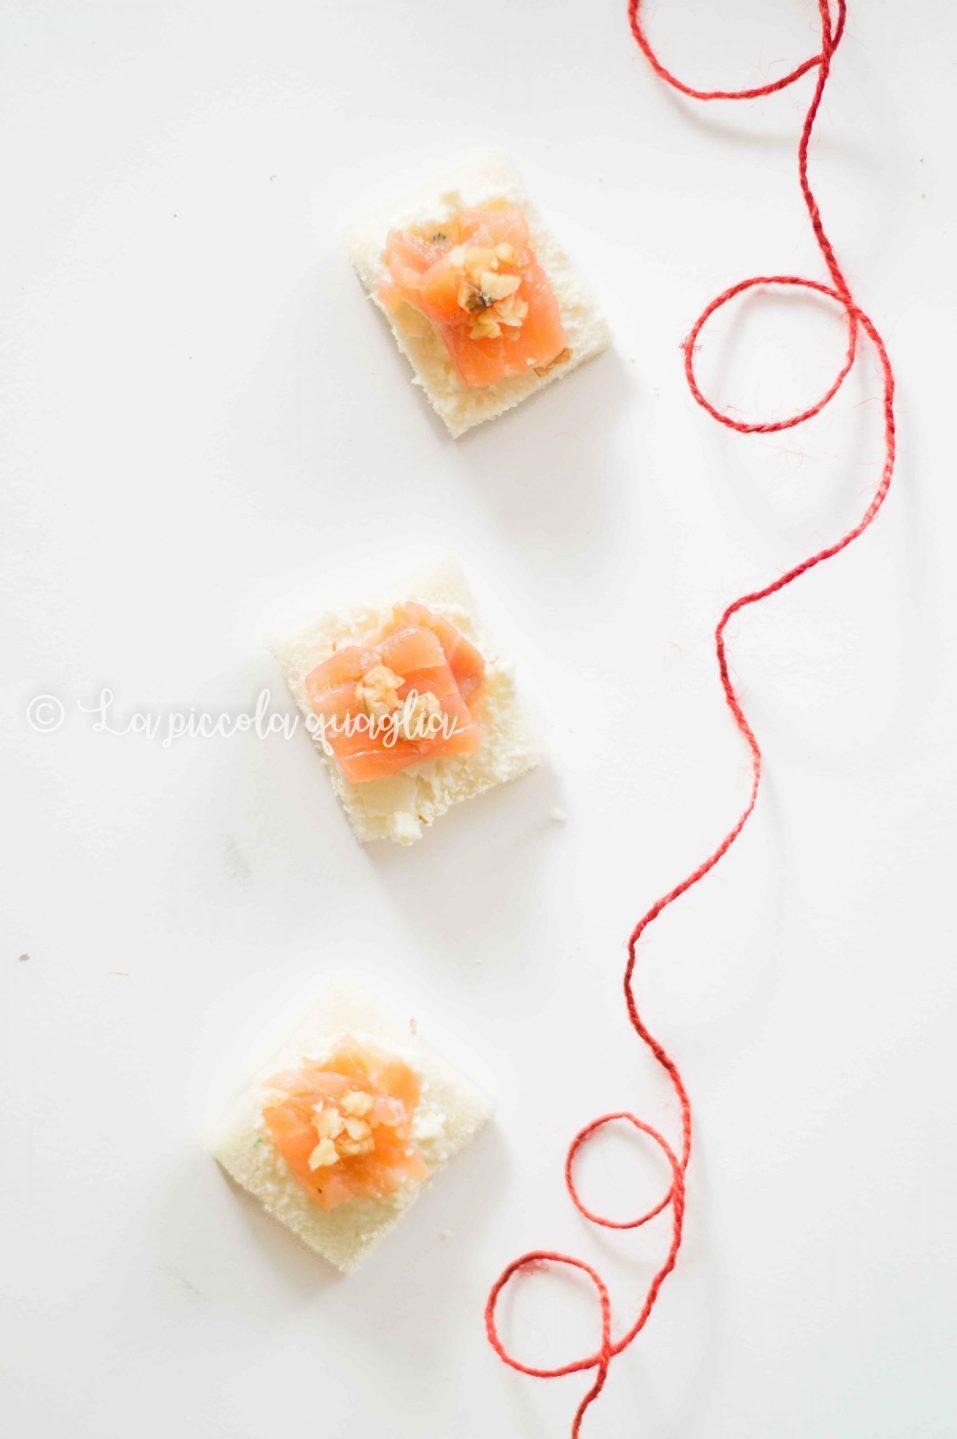 tartine con salmone affumicato